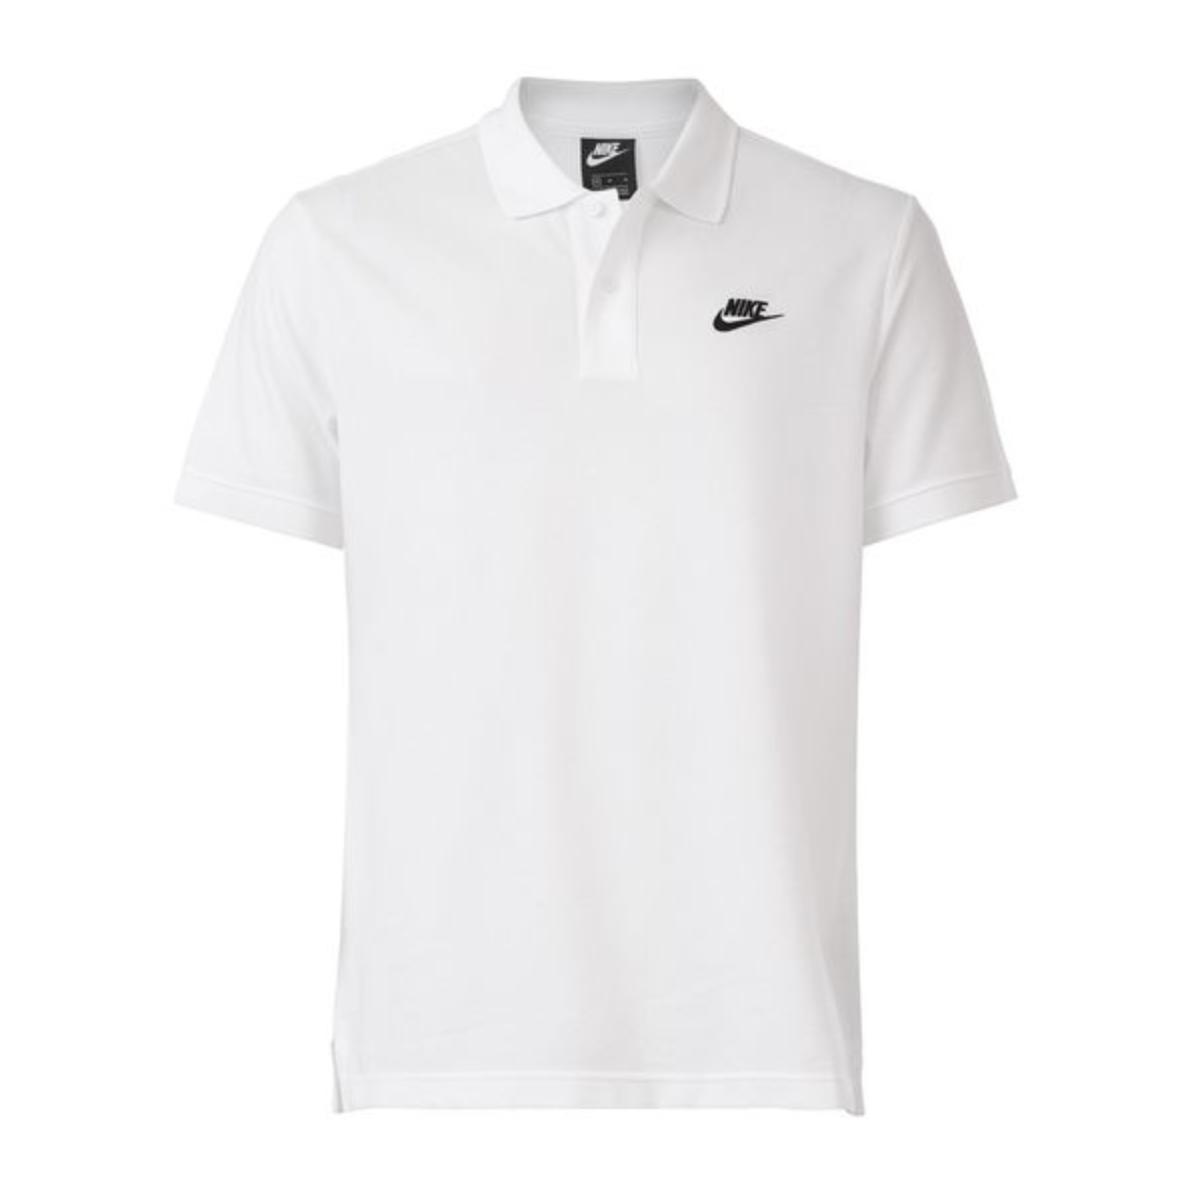 Camiseta Masculina Nike Cj4456-100 Branco